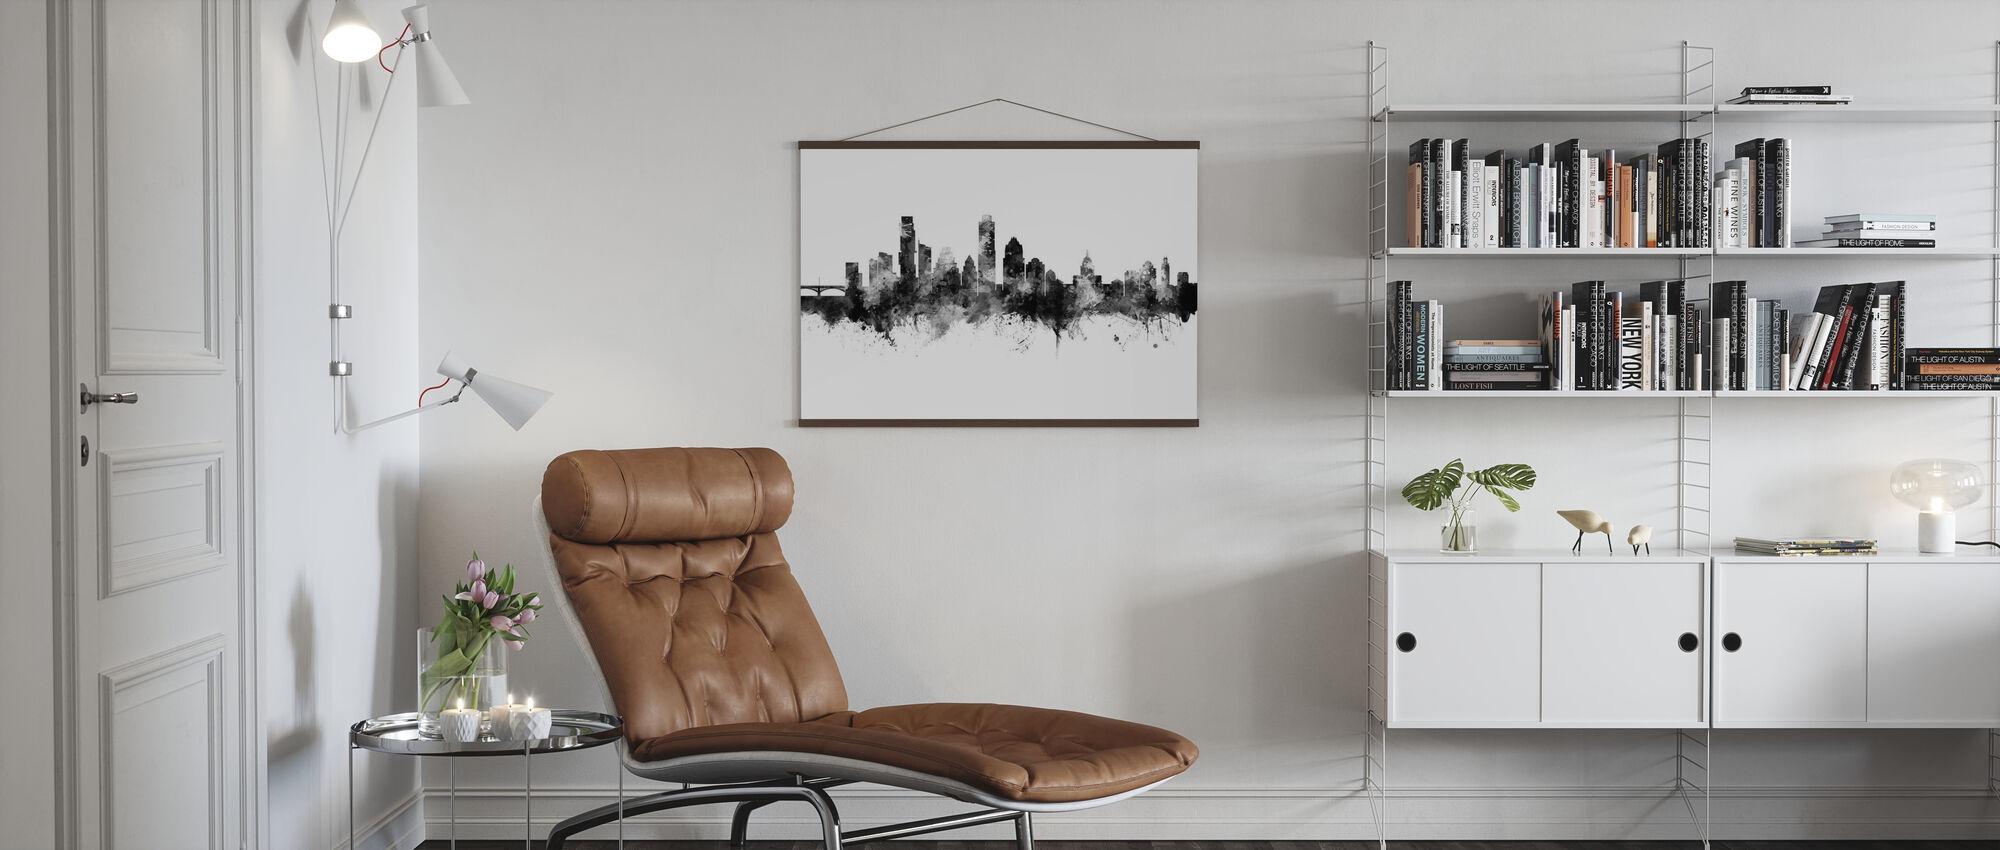 Austin Texas Skyline - Plakat - Stue